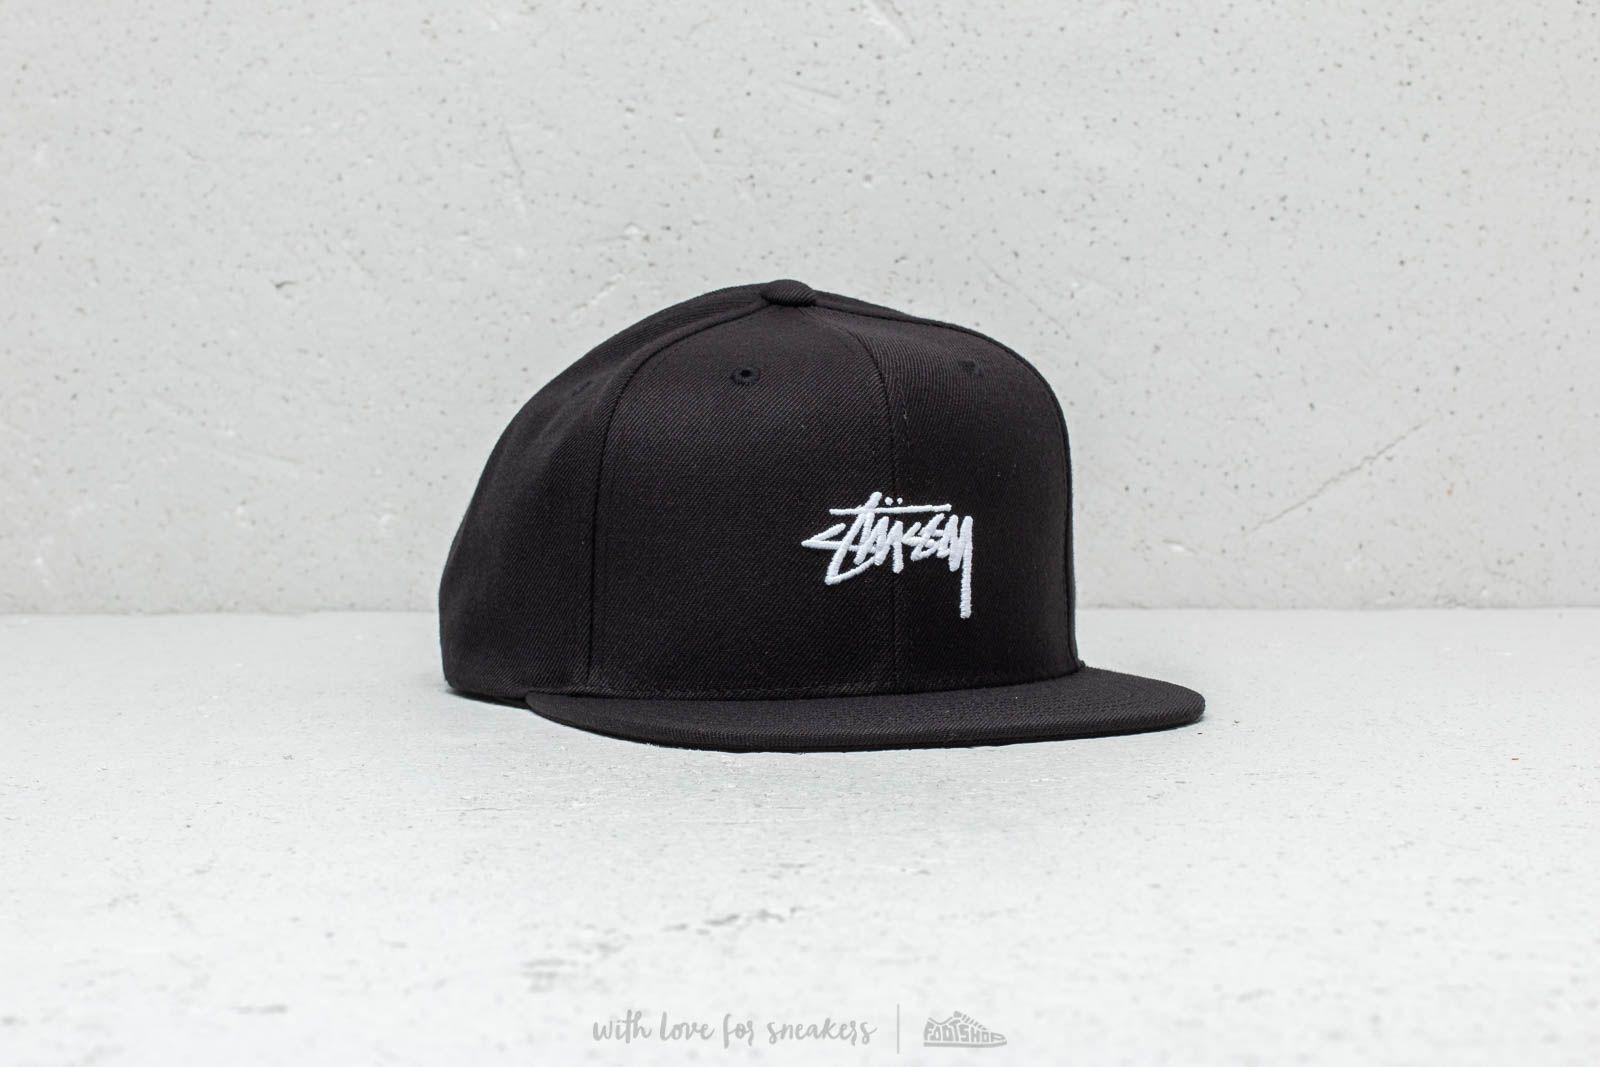 e1d762aad7f Stüssy HO18 Stock Cap Black